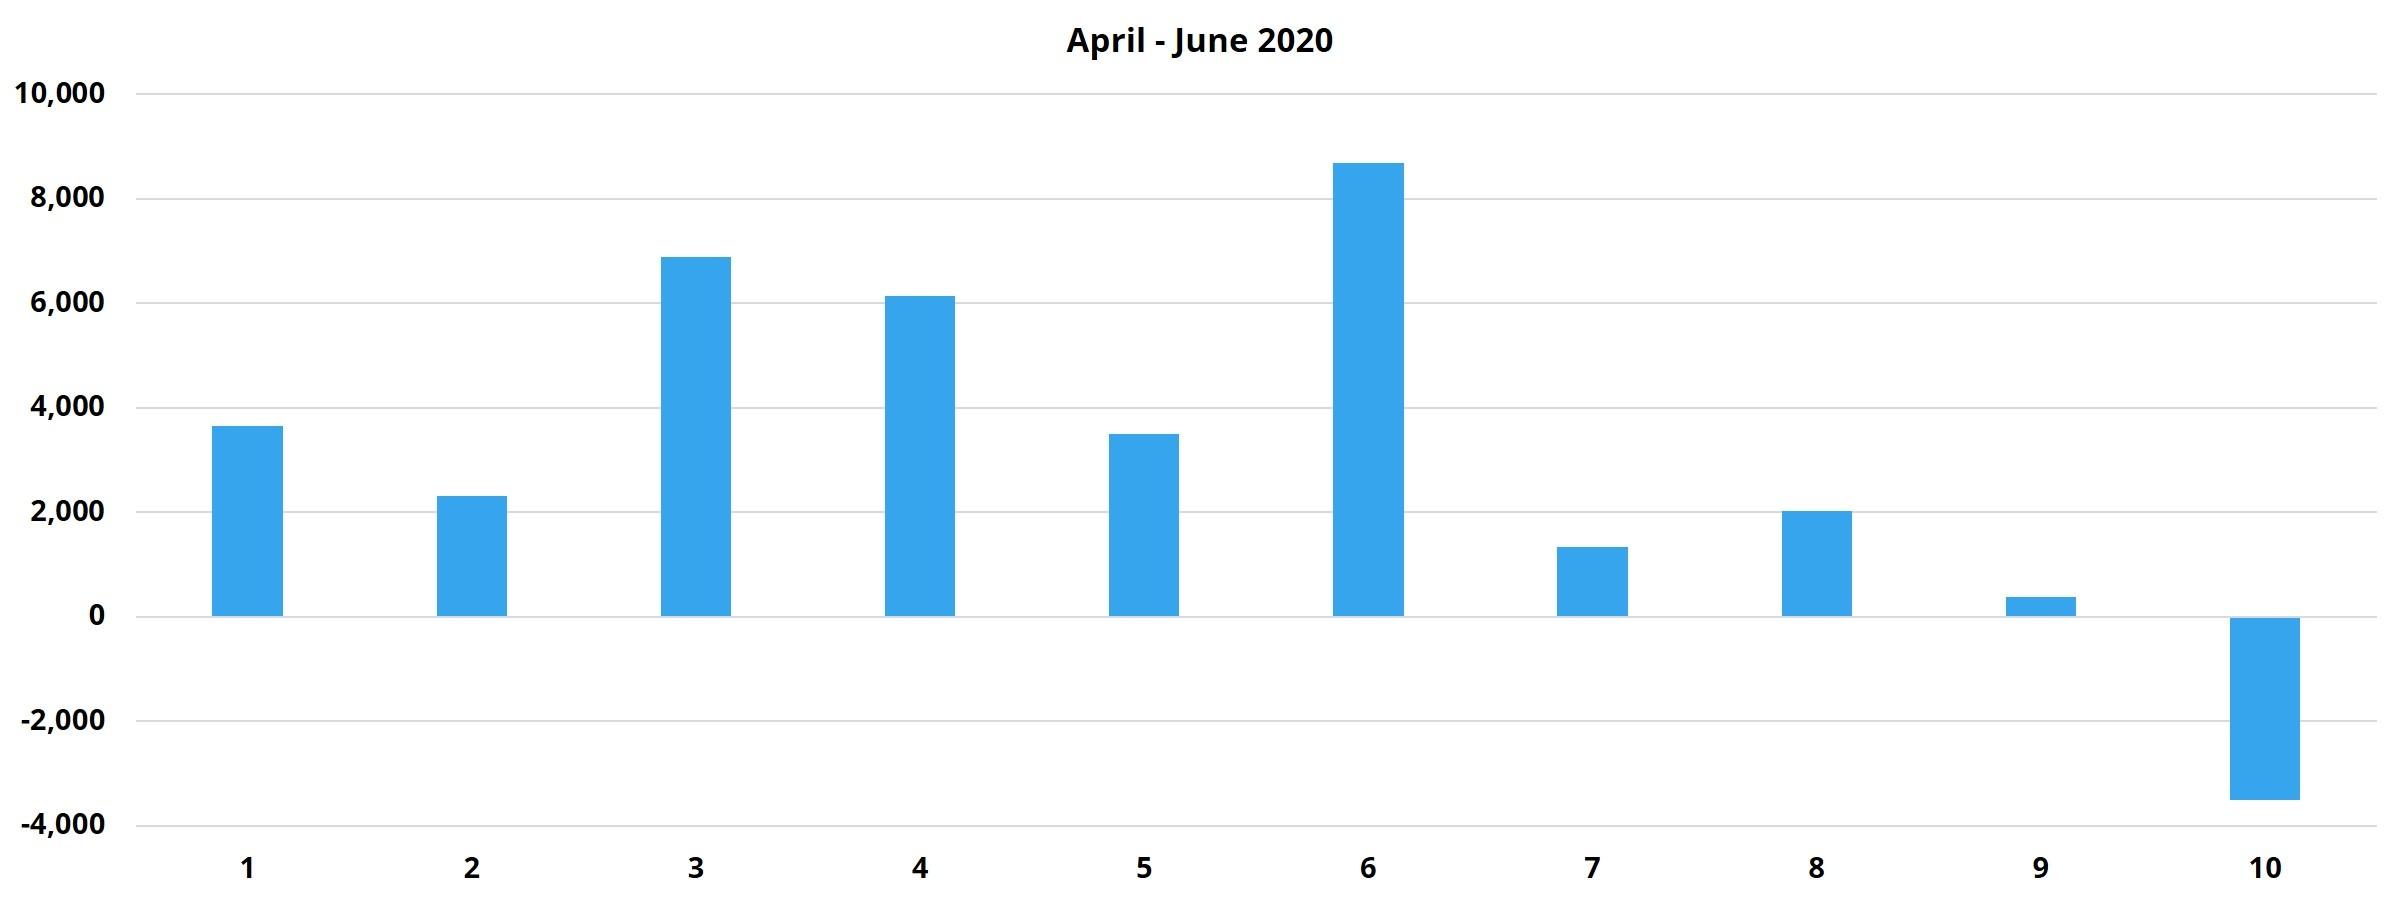 April - June 2020